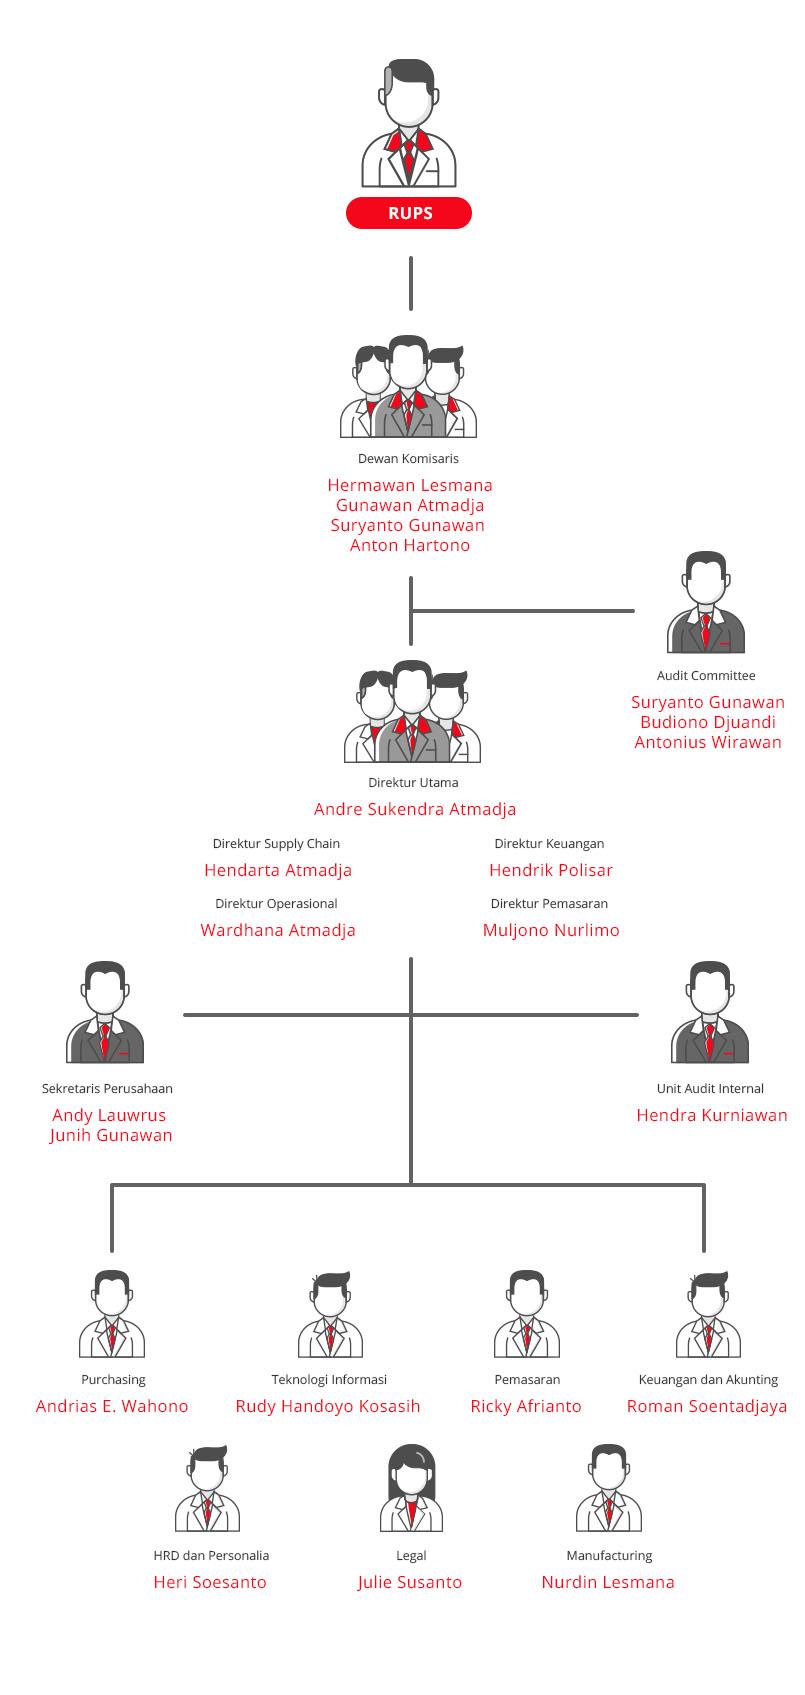 struktur organisasi mayora